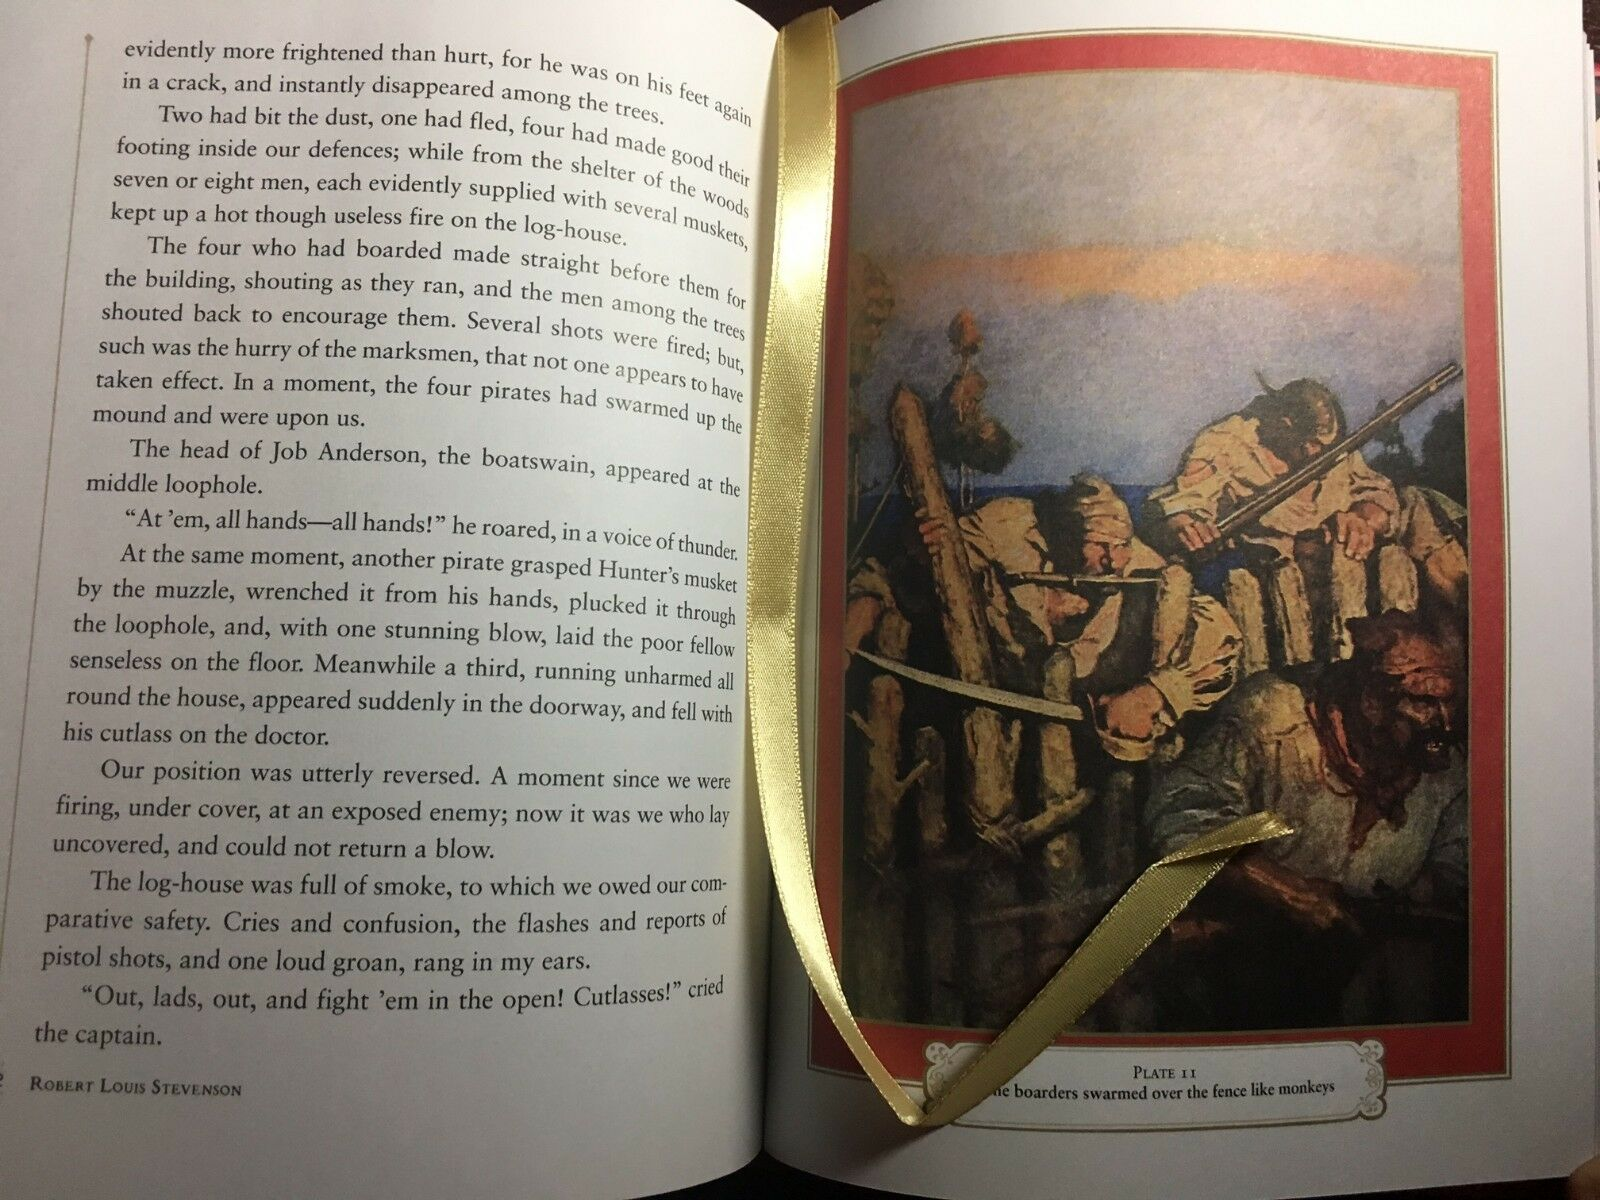 Treasure Island by Stevenson & Illustrated N.C. Wyeth Sealed Leather Hardback For Sale - 7